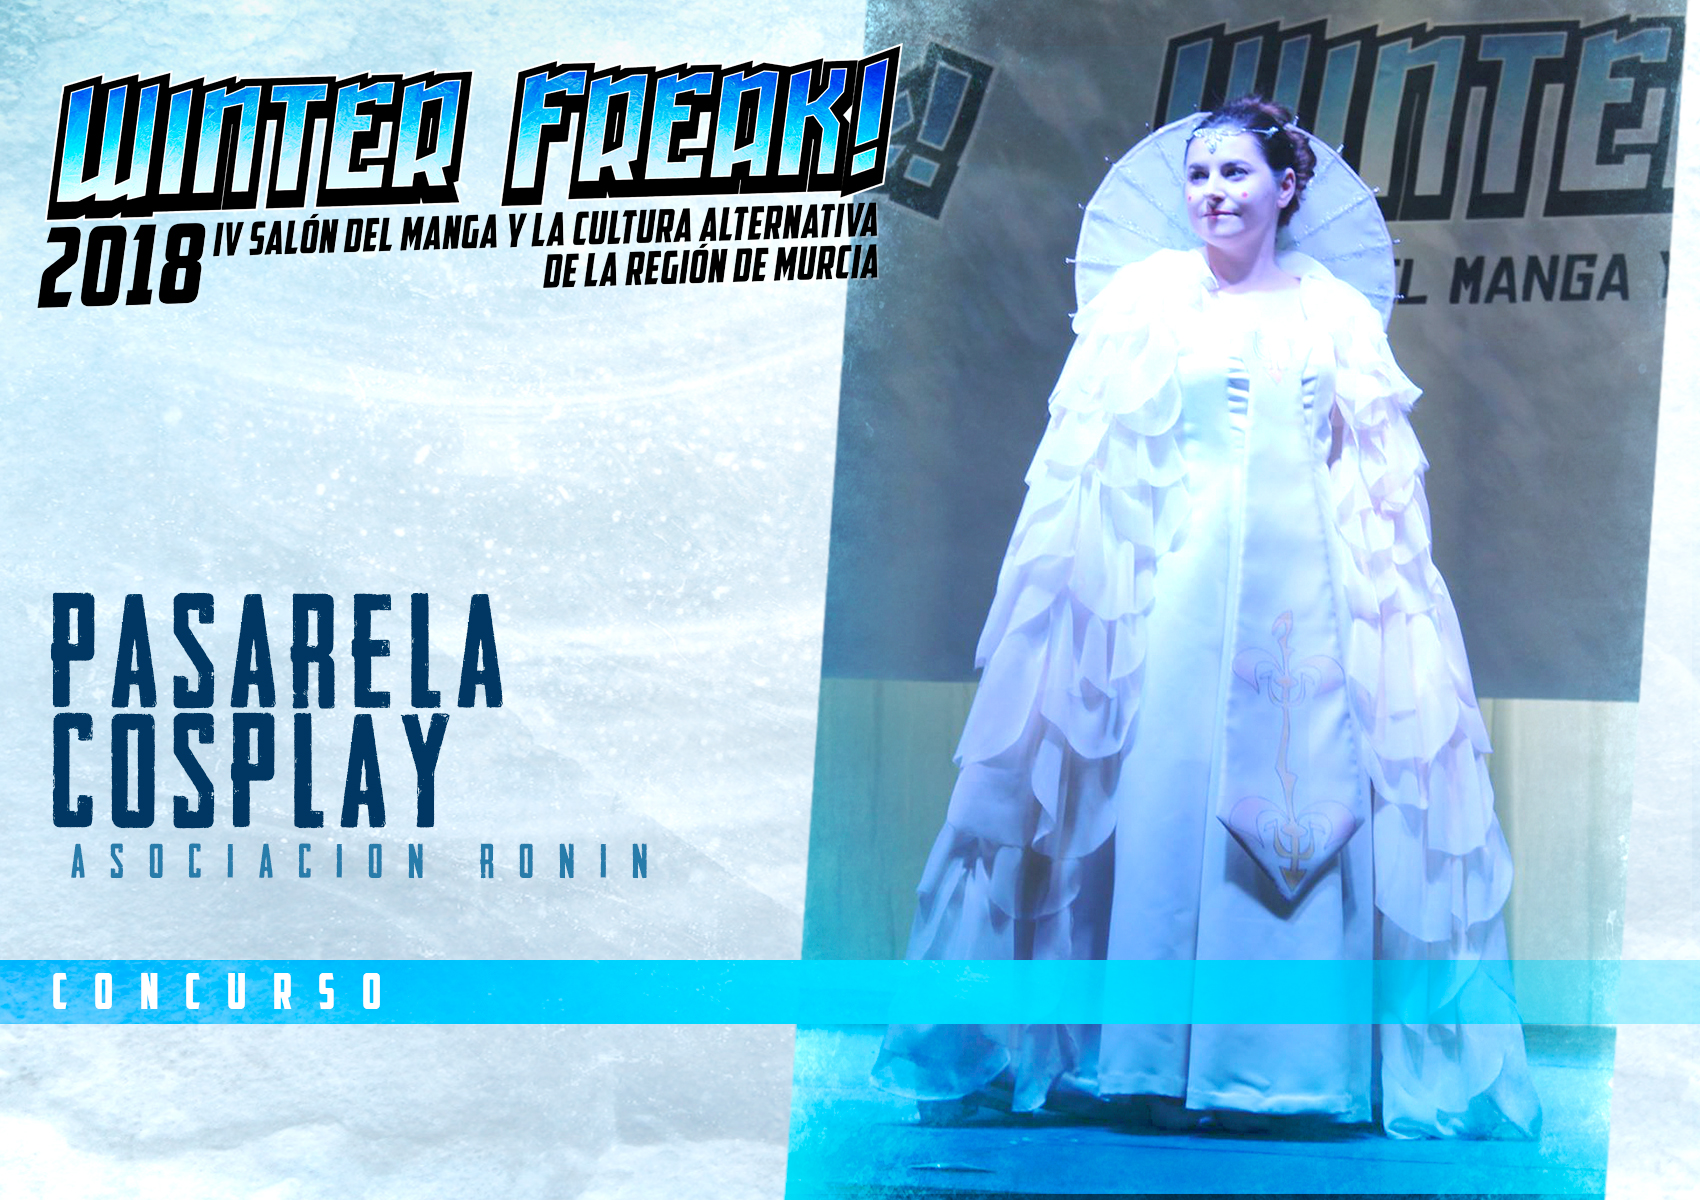 http://winterfreak.universofreak.com/wp-content/uploads/2018/01/WF_2018-concurso-pasarela-cosplay-ronin.jpg